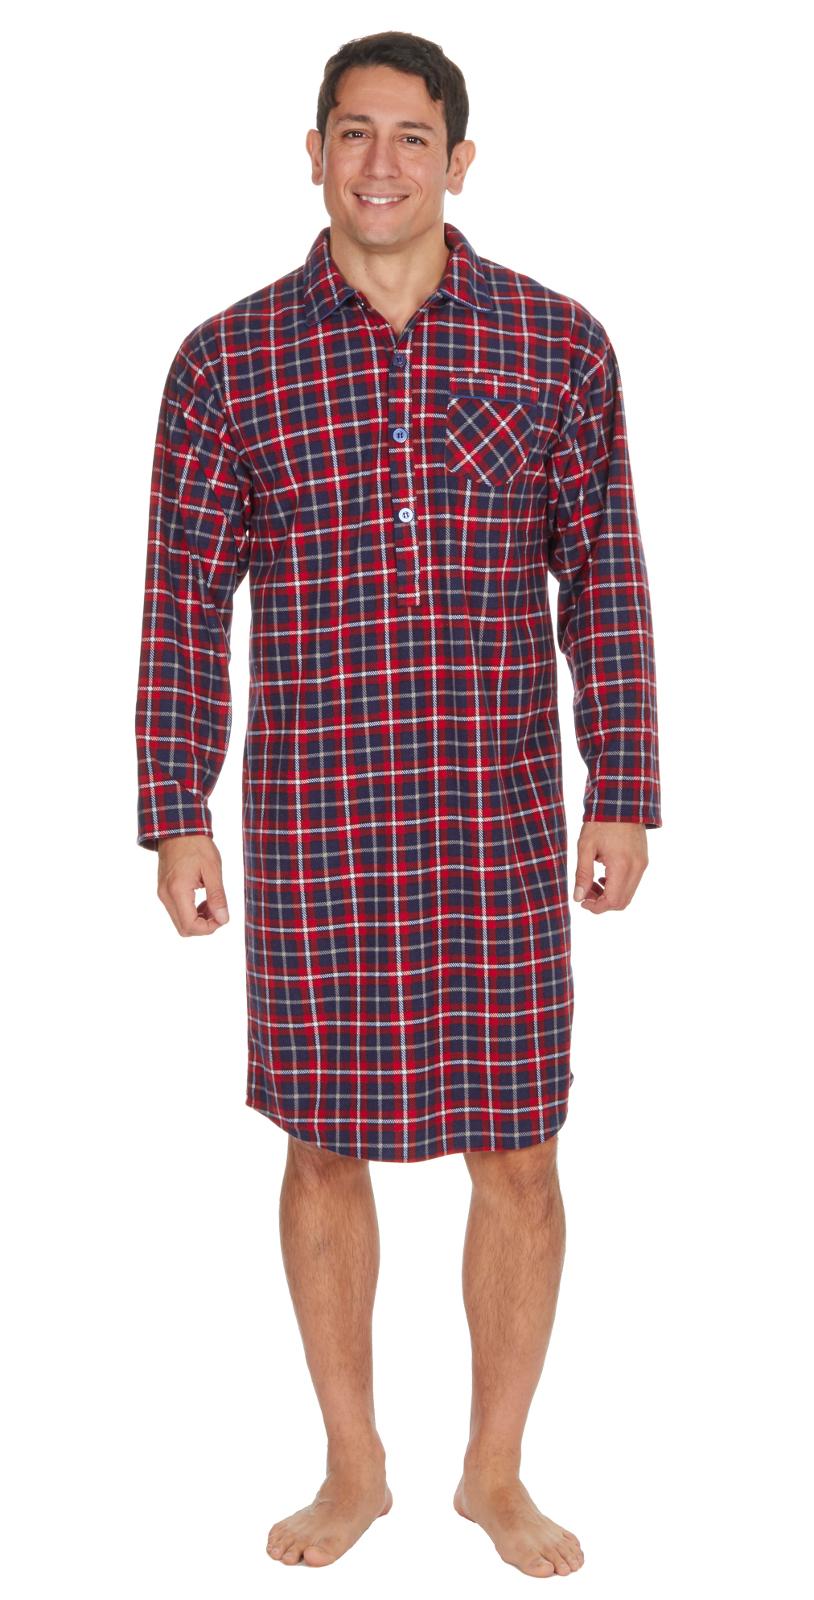 Mens Night Shirt Traditional Striped Nightshirt Brushed Flannel Warm Pyjamas